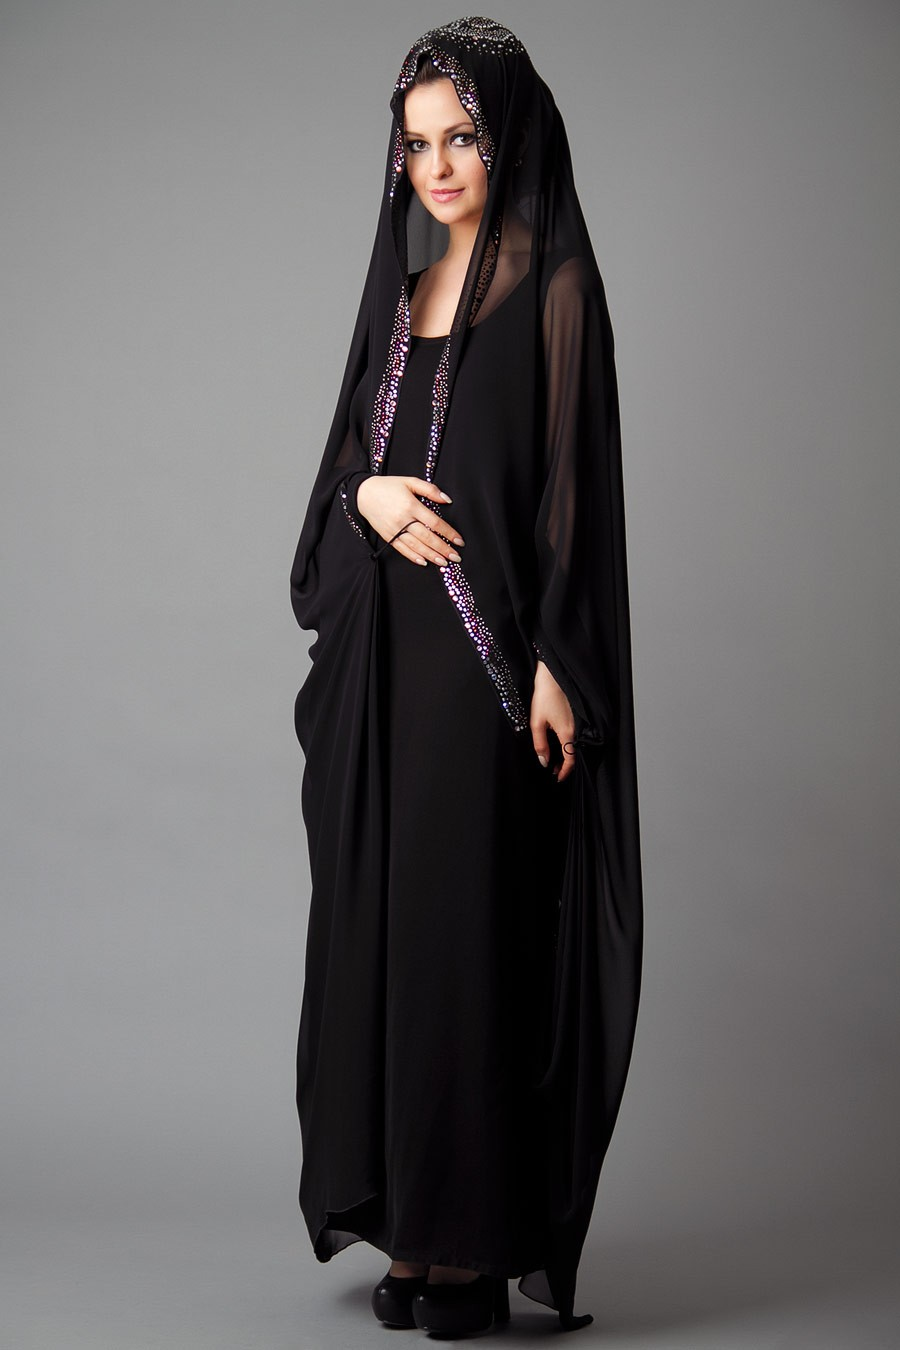 New Hijab Design